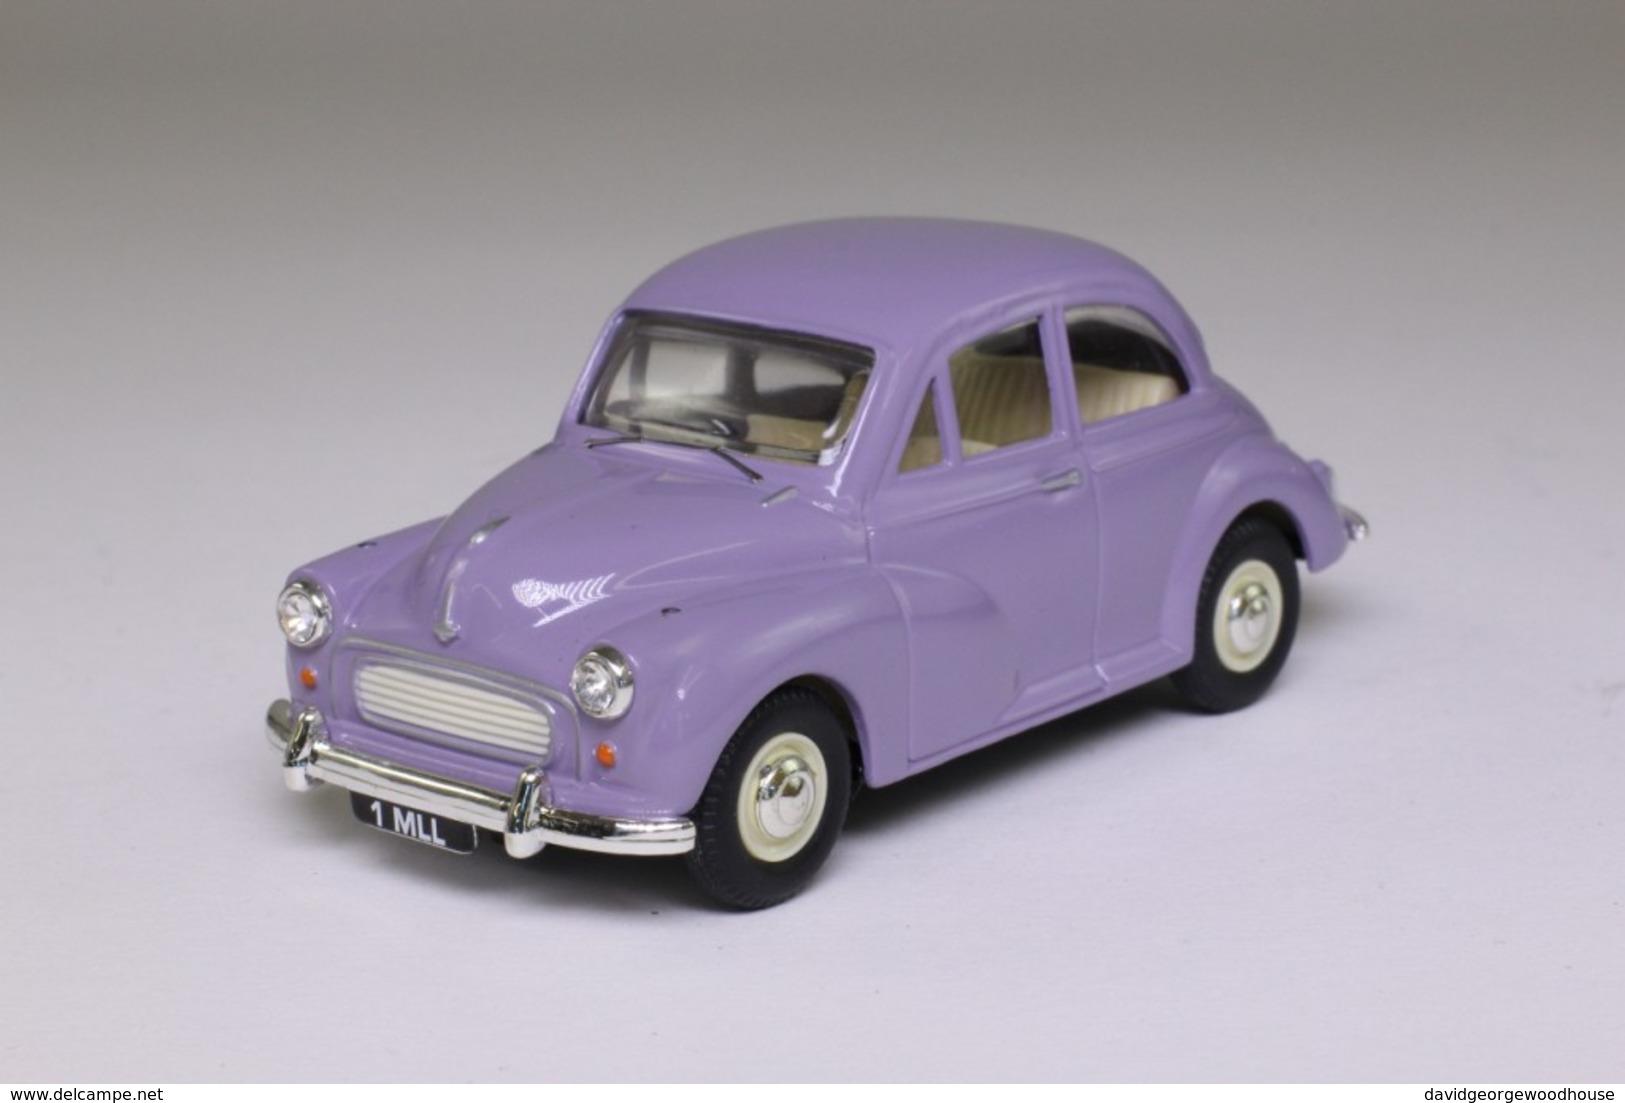 Millionth Morris Minor 1000. - Cars & 4-wheels